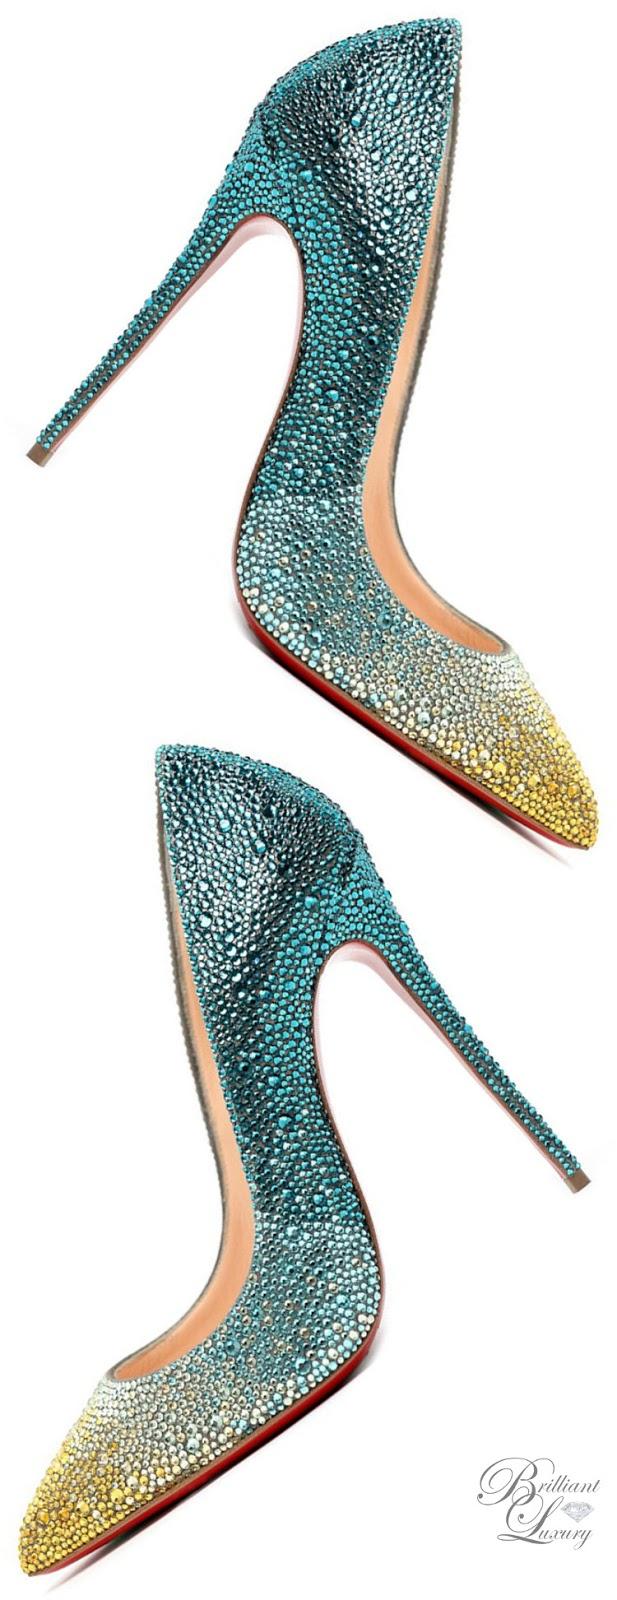 Brilliant Luxury ♦ Christian Louboutin Pigalle Follies Strass